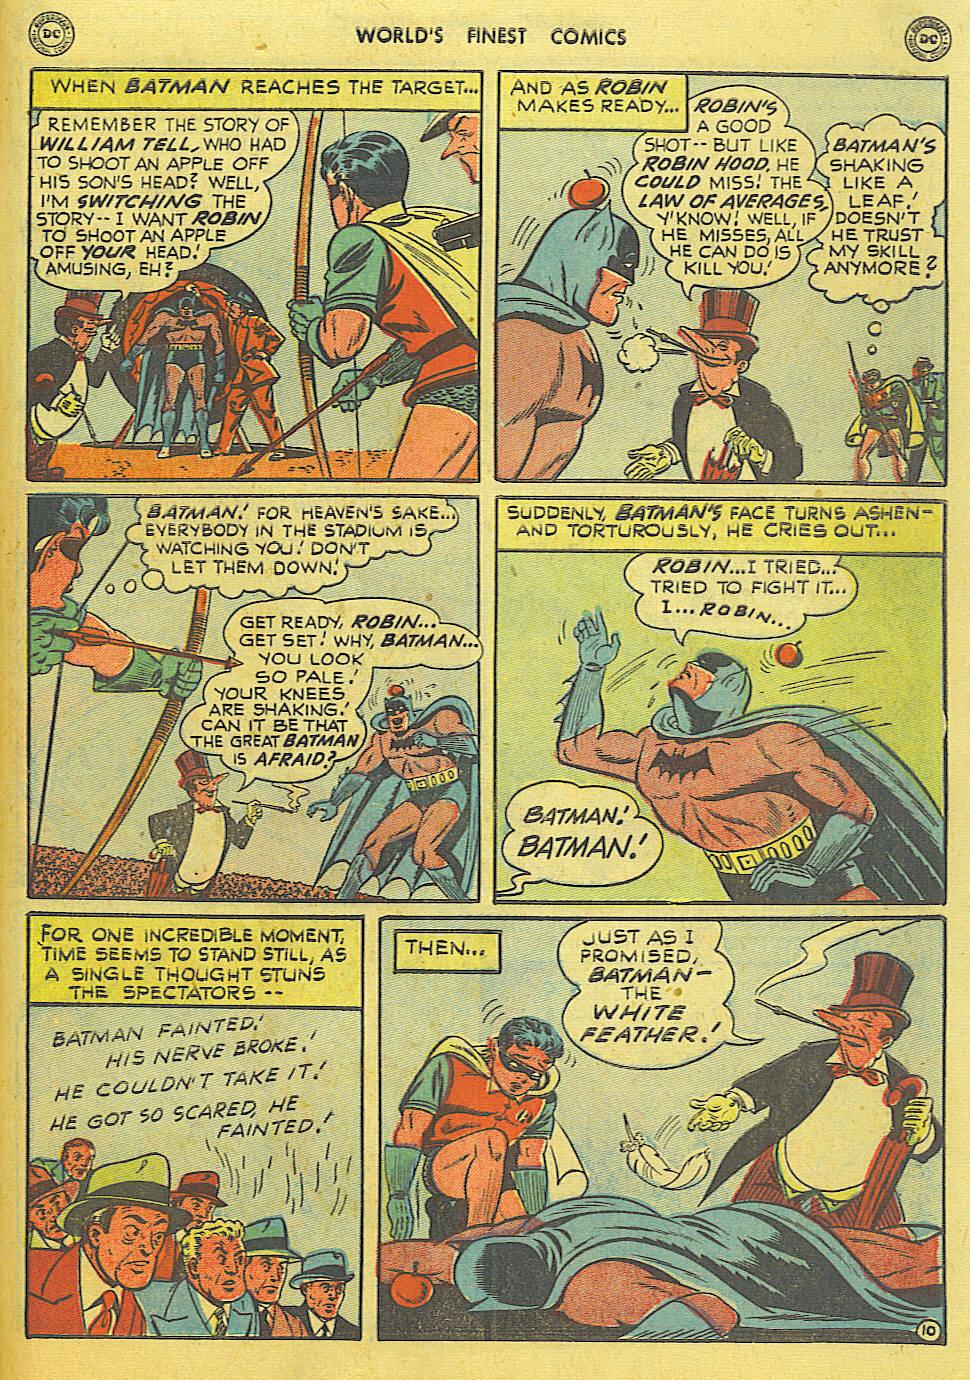 Read online World's Finest Comics comic -  Issue #49 - 72